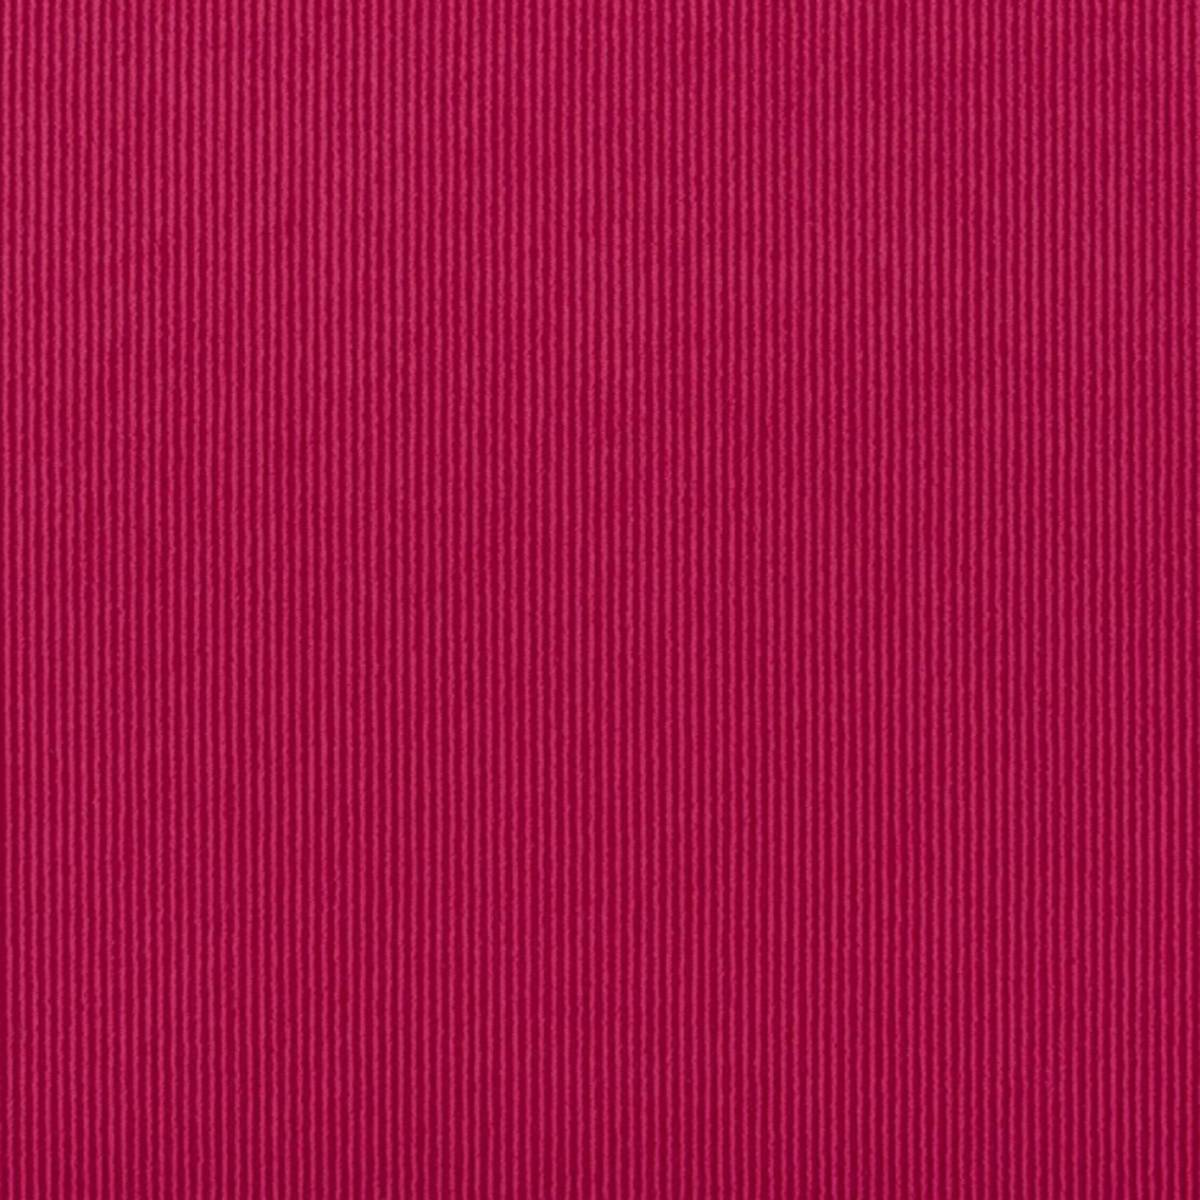 Tammaro Fabrics Poppy Fdg2748 35 Designers Guild